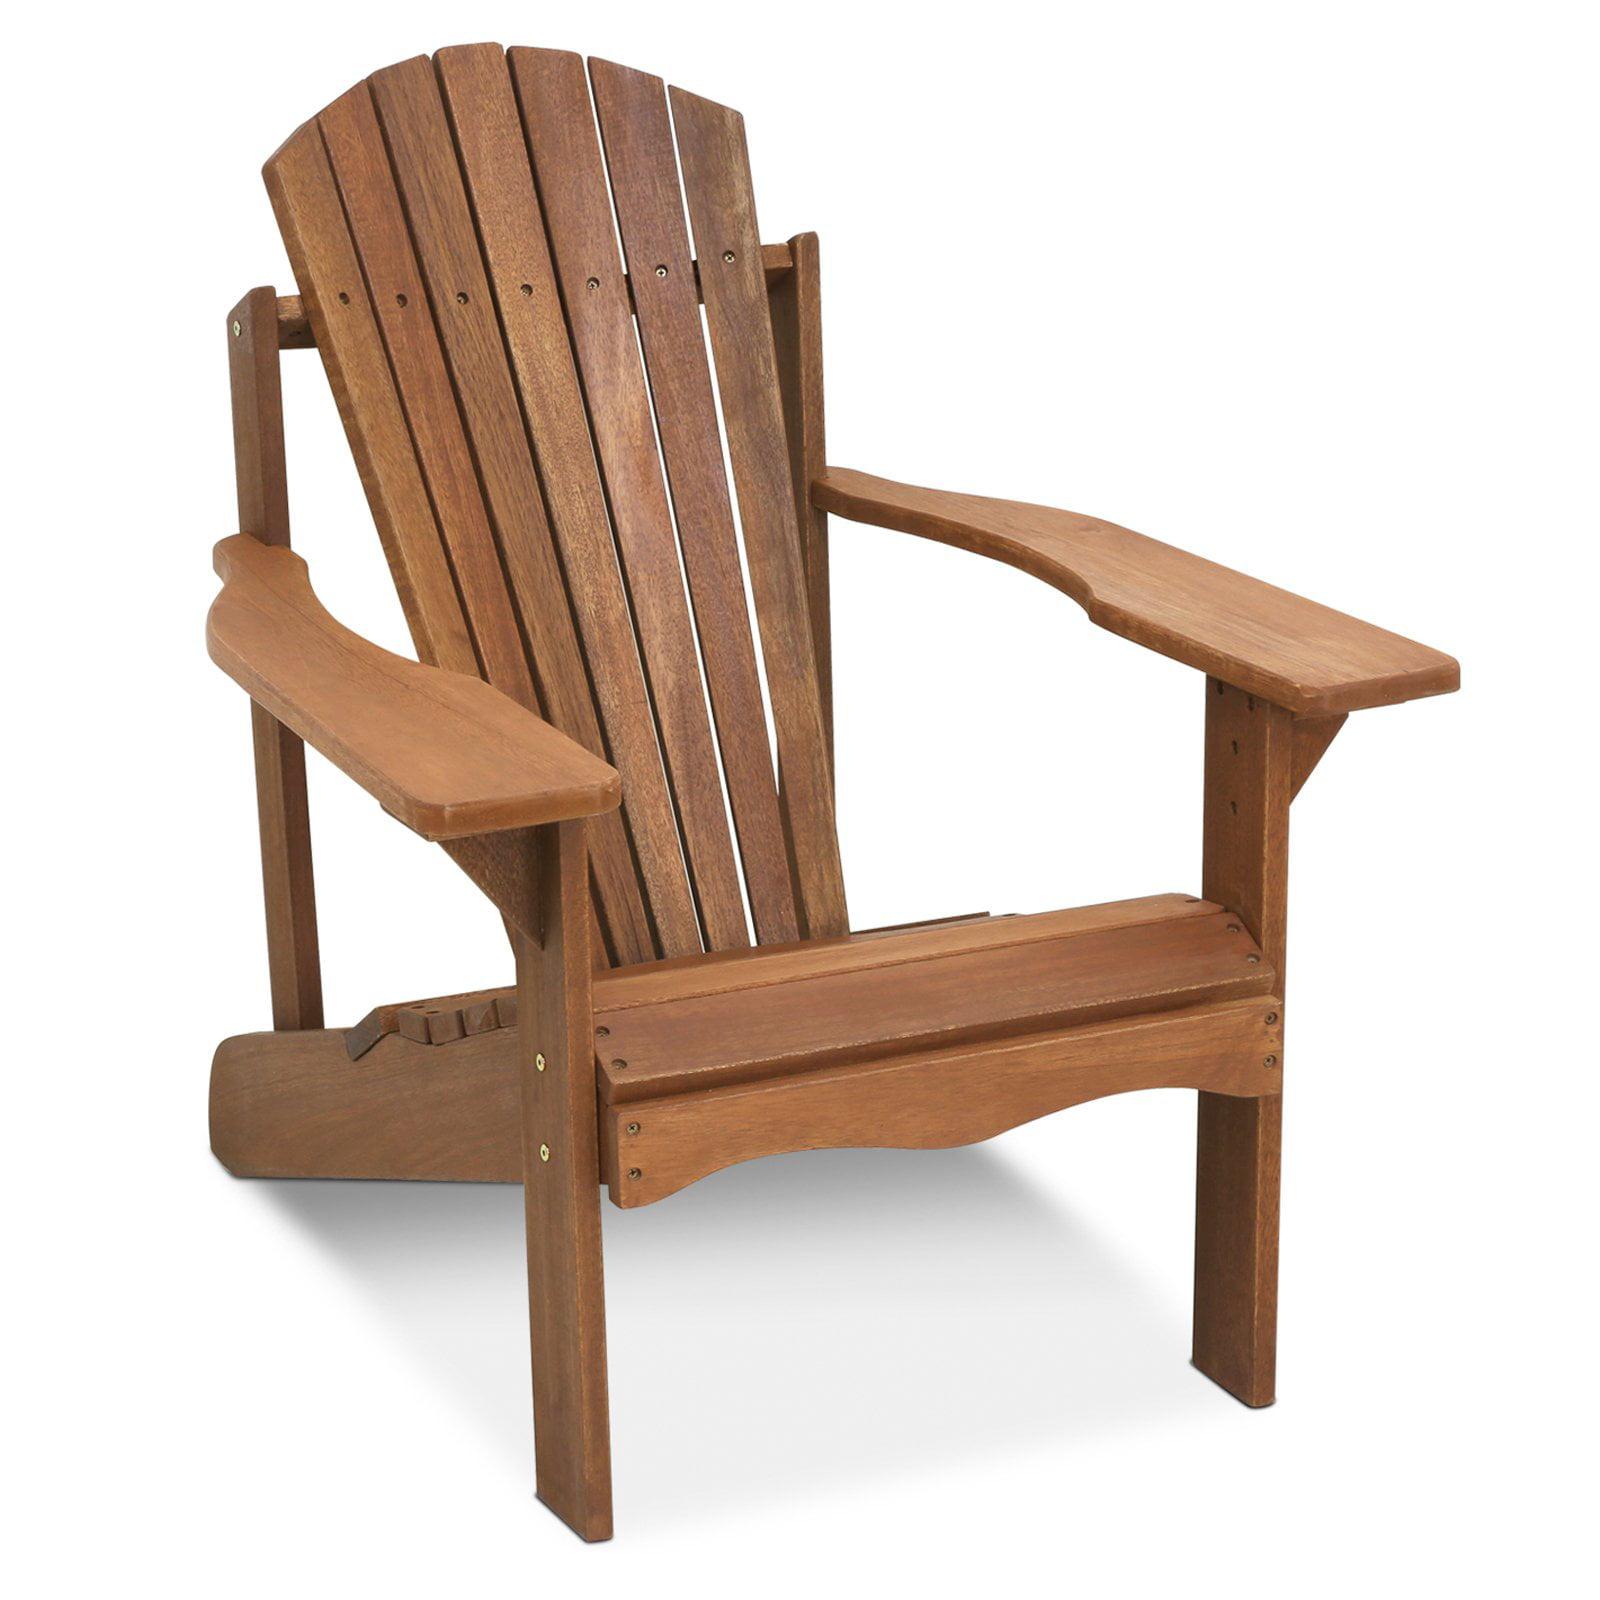 Furinno Tioman Hardwood Adirondack Patio Chair